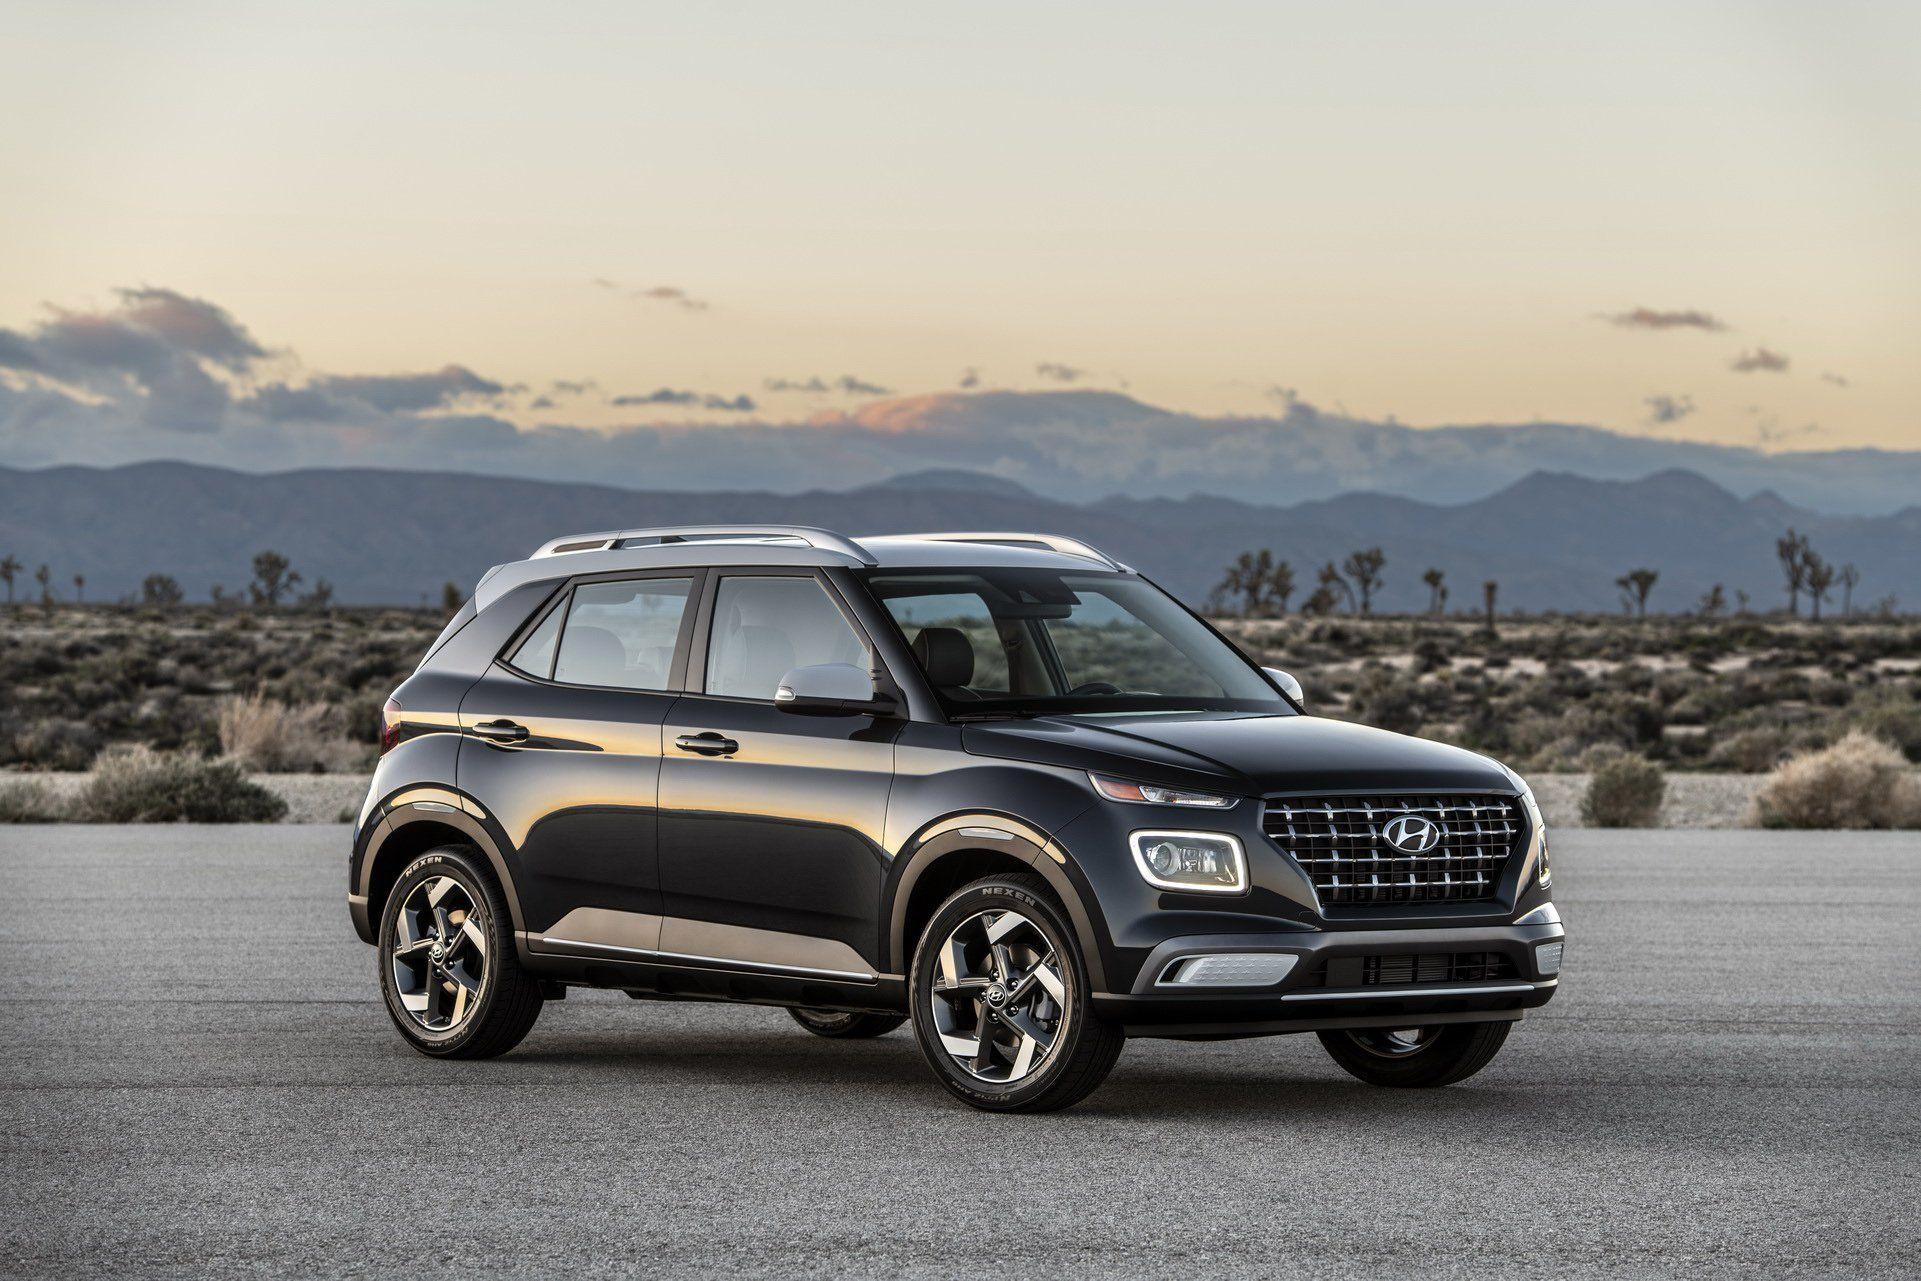 2020 Hyundai Venue Aims To Prove Small Crossovers Don't